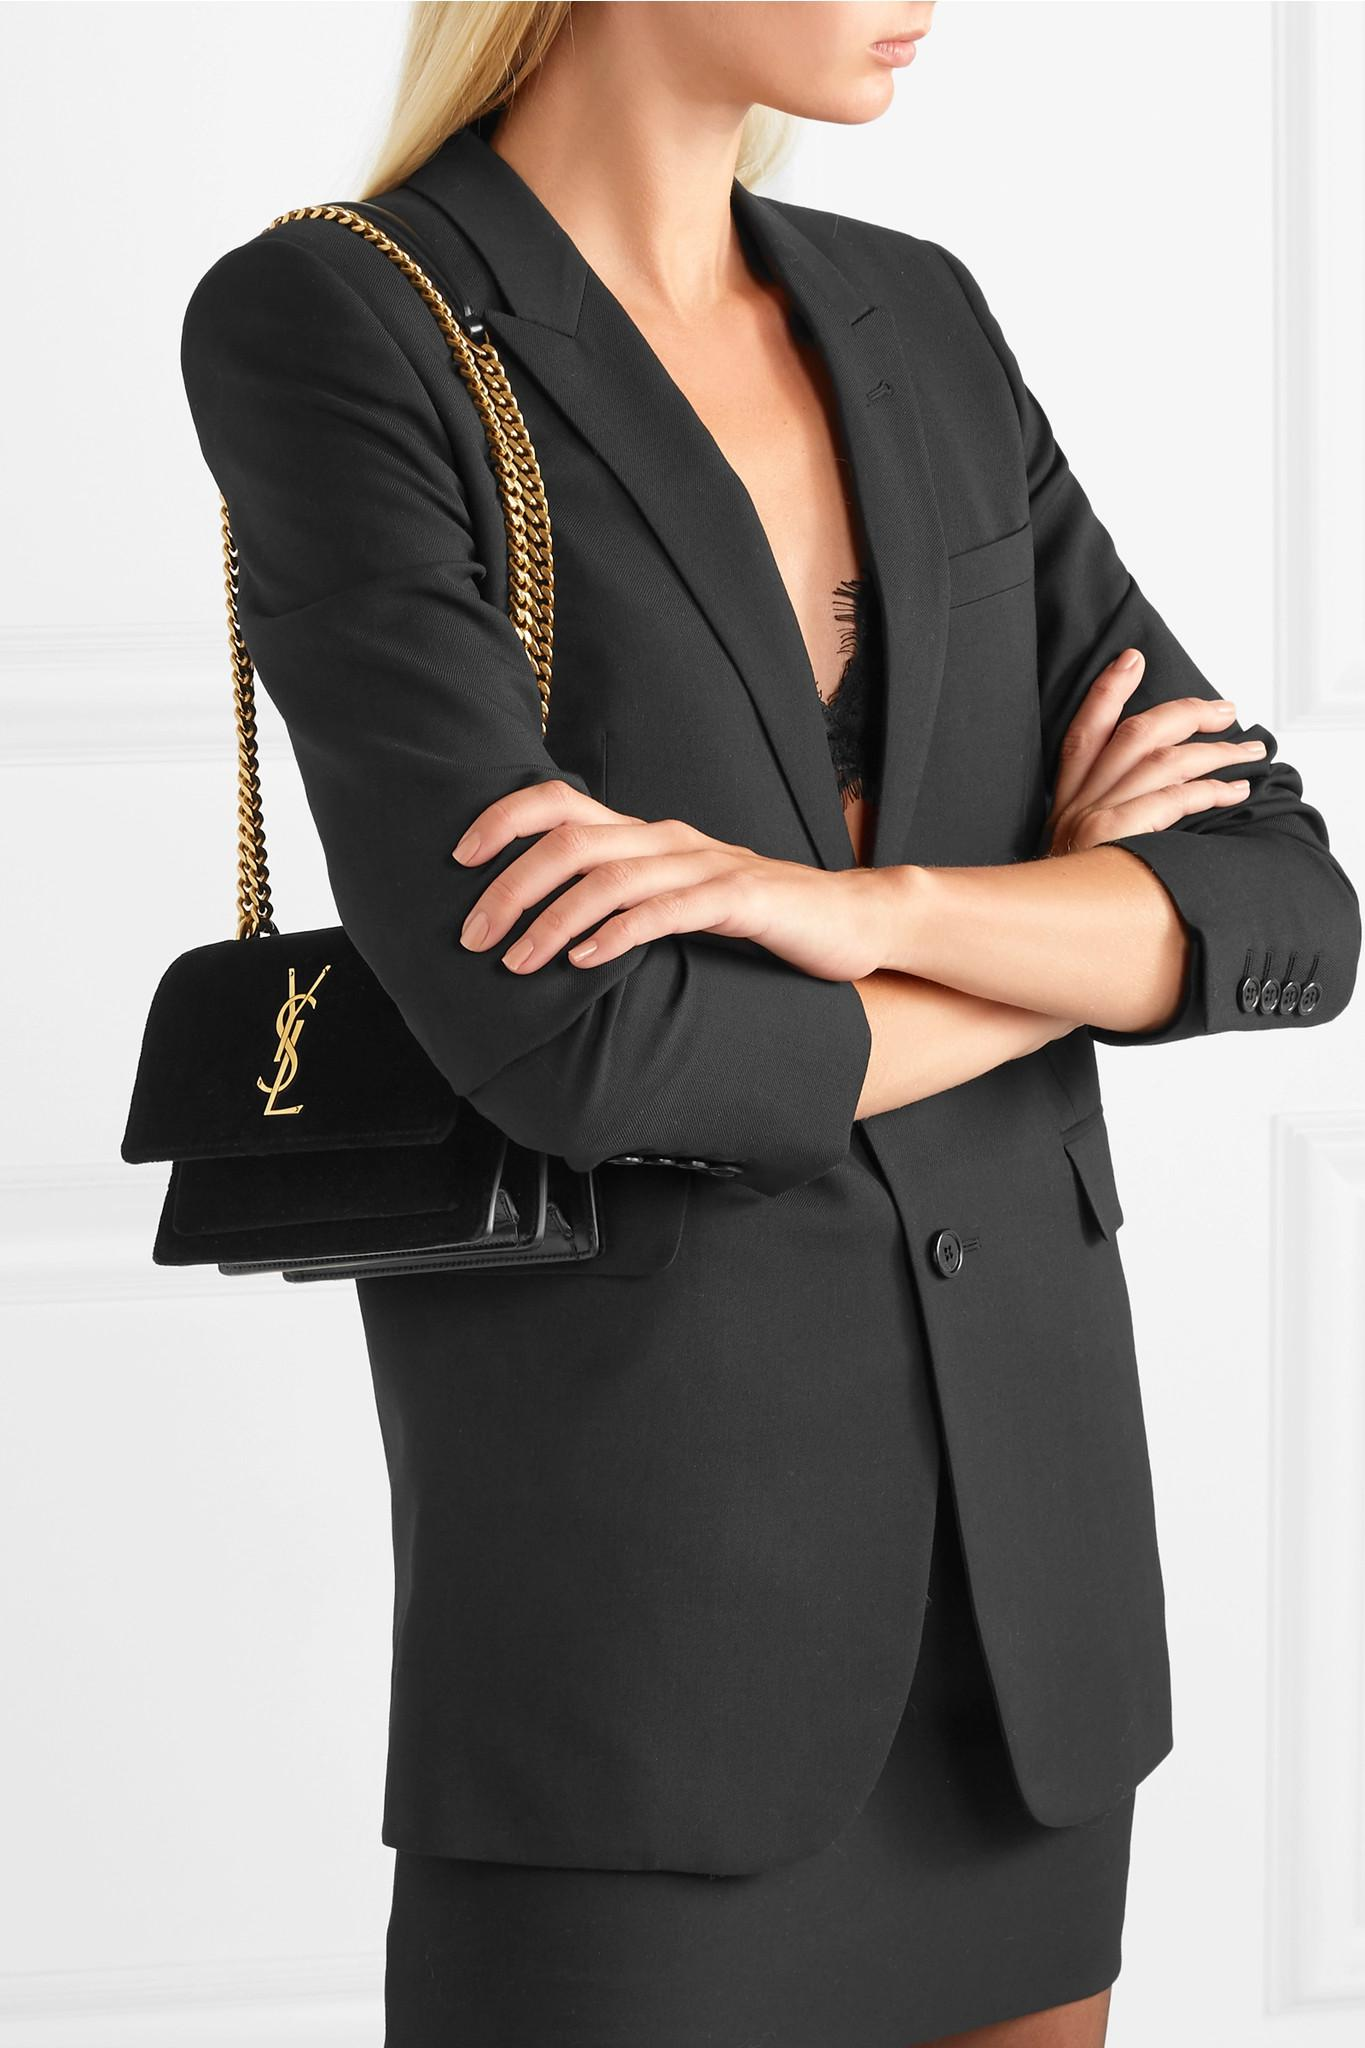 e9fdfeb4464d Lyst - Saint Laurent Sunset Small Velvet And Leather Shoulder Bag in ...